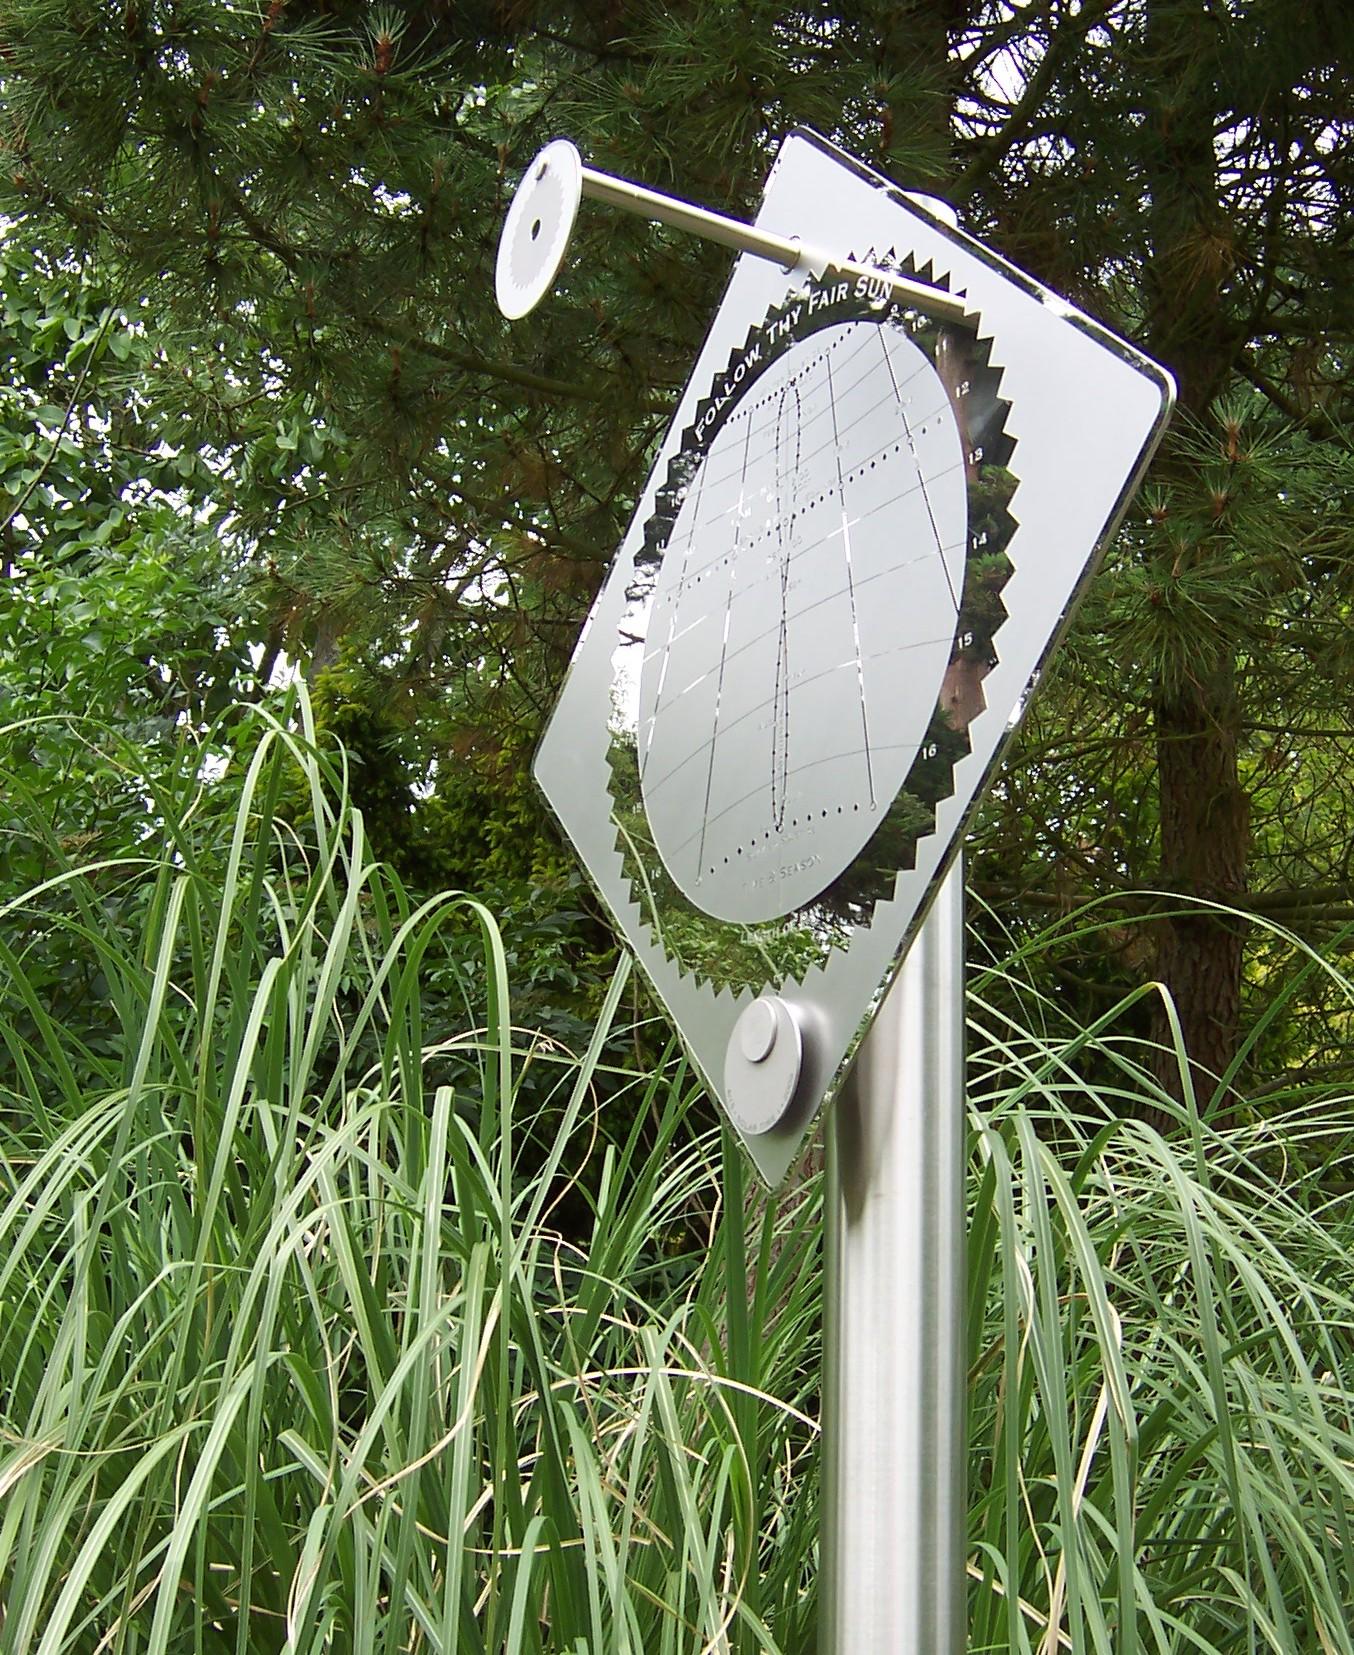 Sundial at Borde Hill Garden